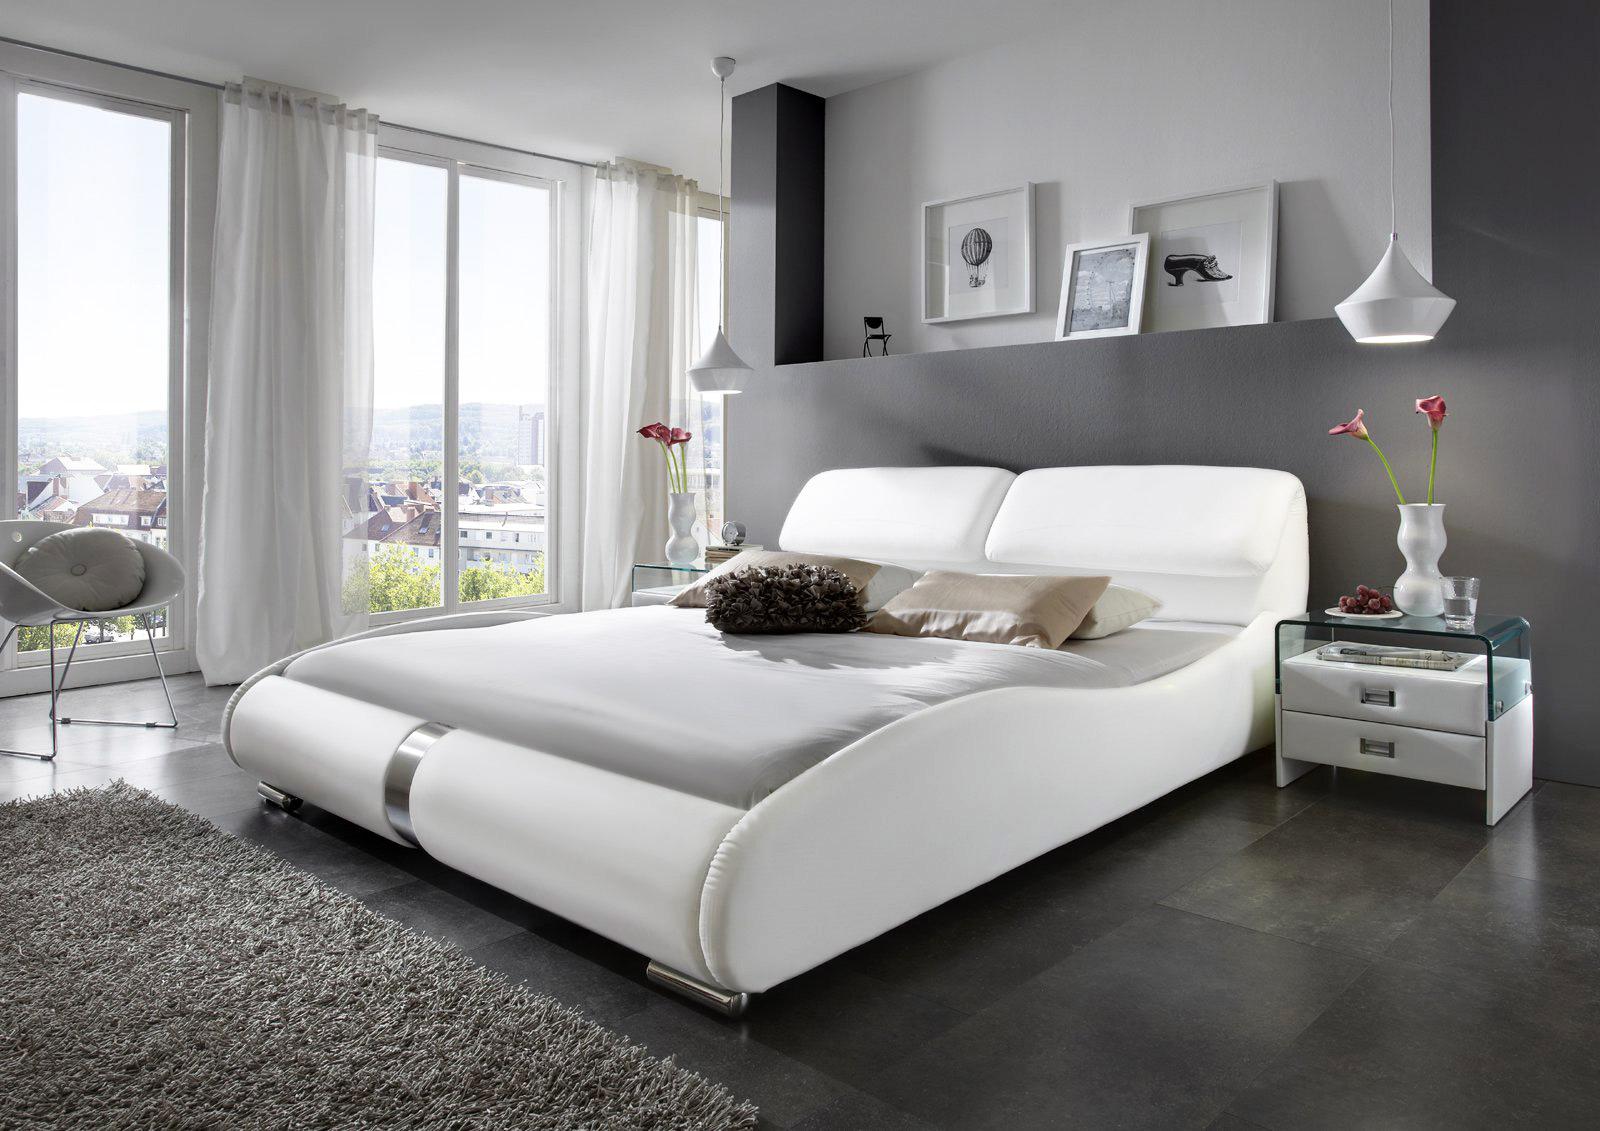 sale polsterbett g nstig wei 140 x 200 cm lucca. Black Bedroom Furniture Sets. Home Design Ideas